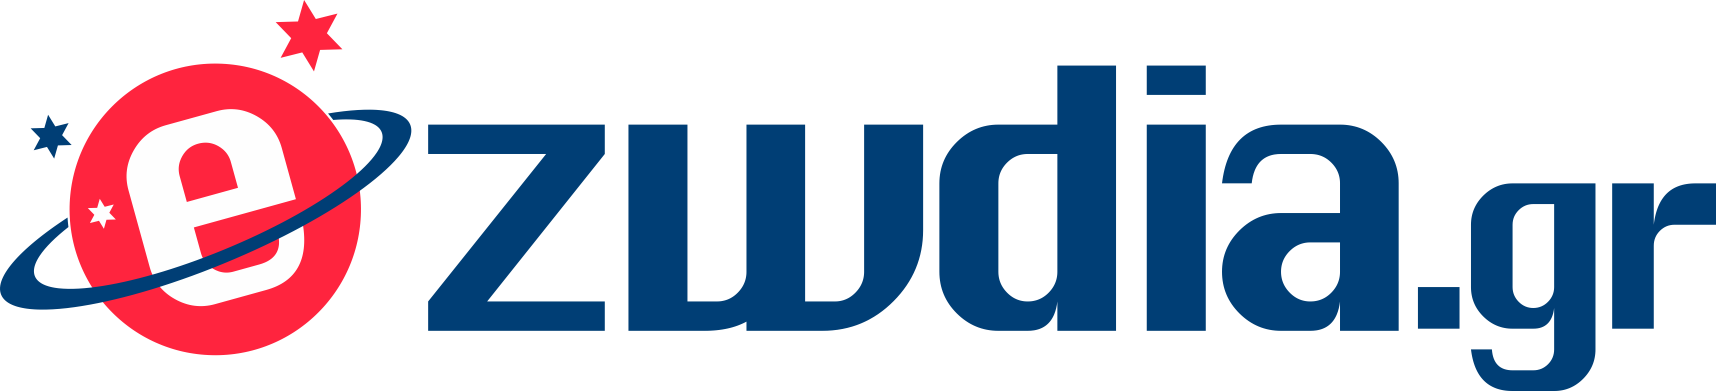 ezwdia logo